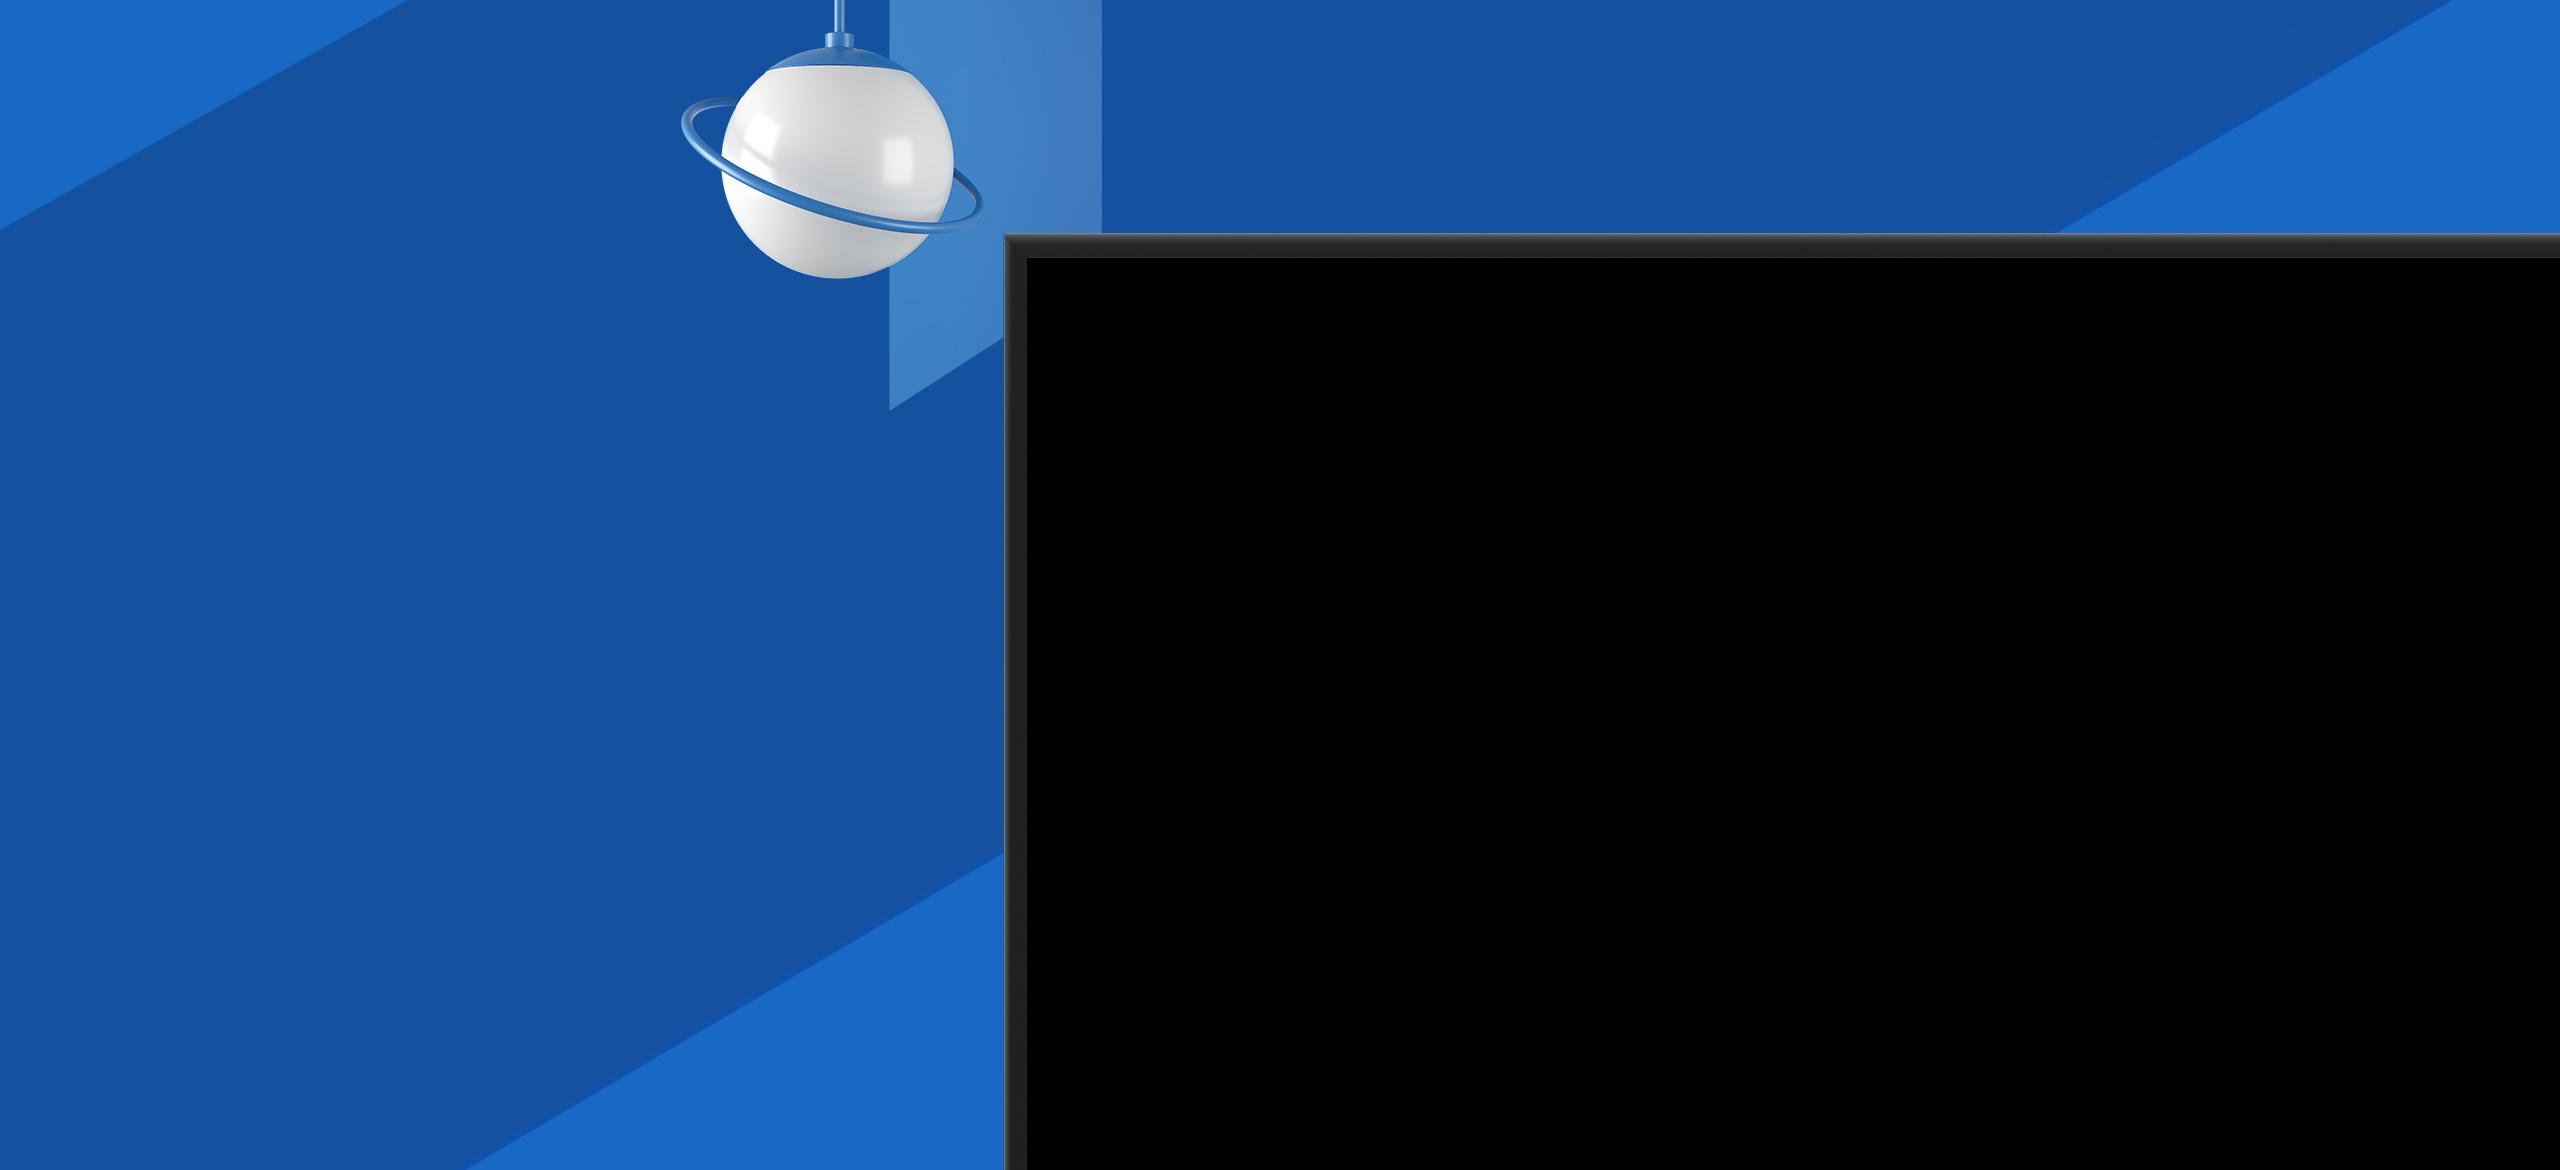 Mi LED TV 4A PRO 108 cm (43) - Full HD Smart TV